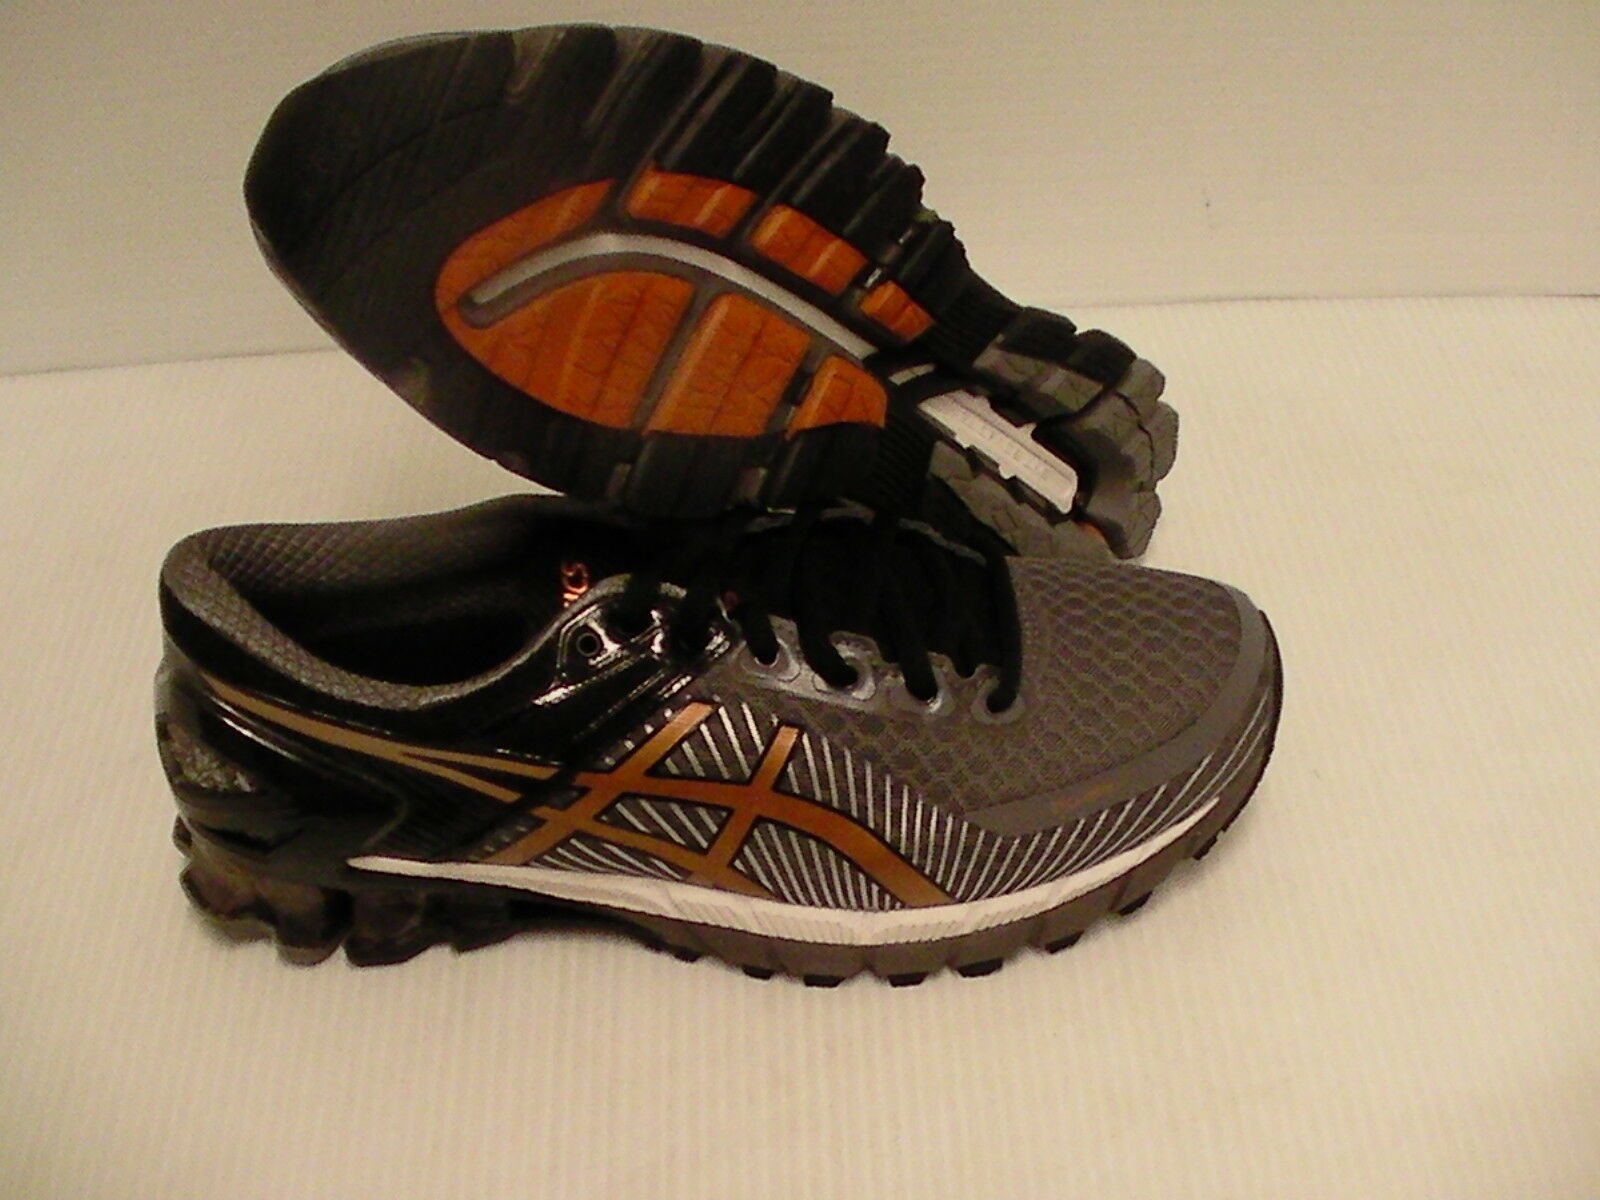 Asics herren gel kinsei 6 running running running schuhe carbon copper schwarz Größe 7.5 us 2c7e46